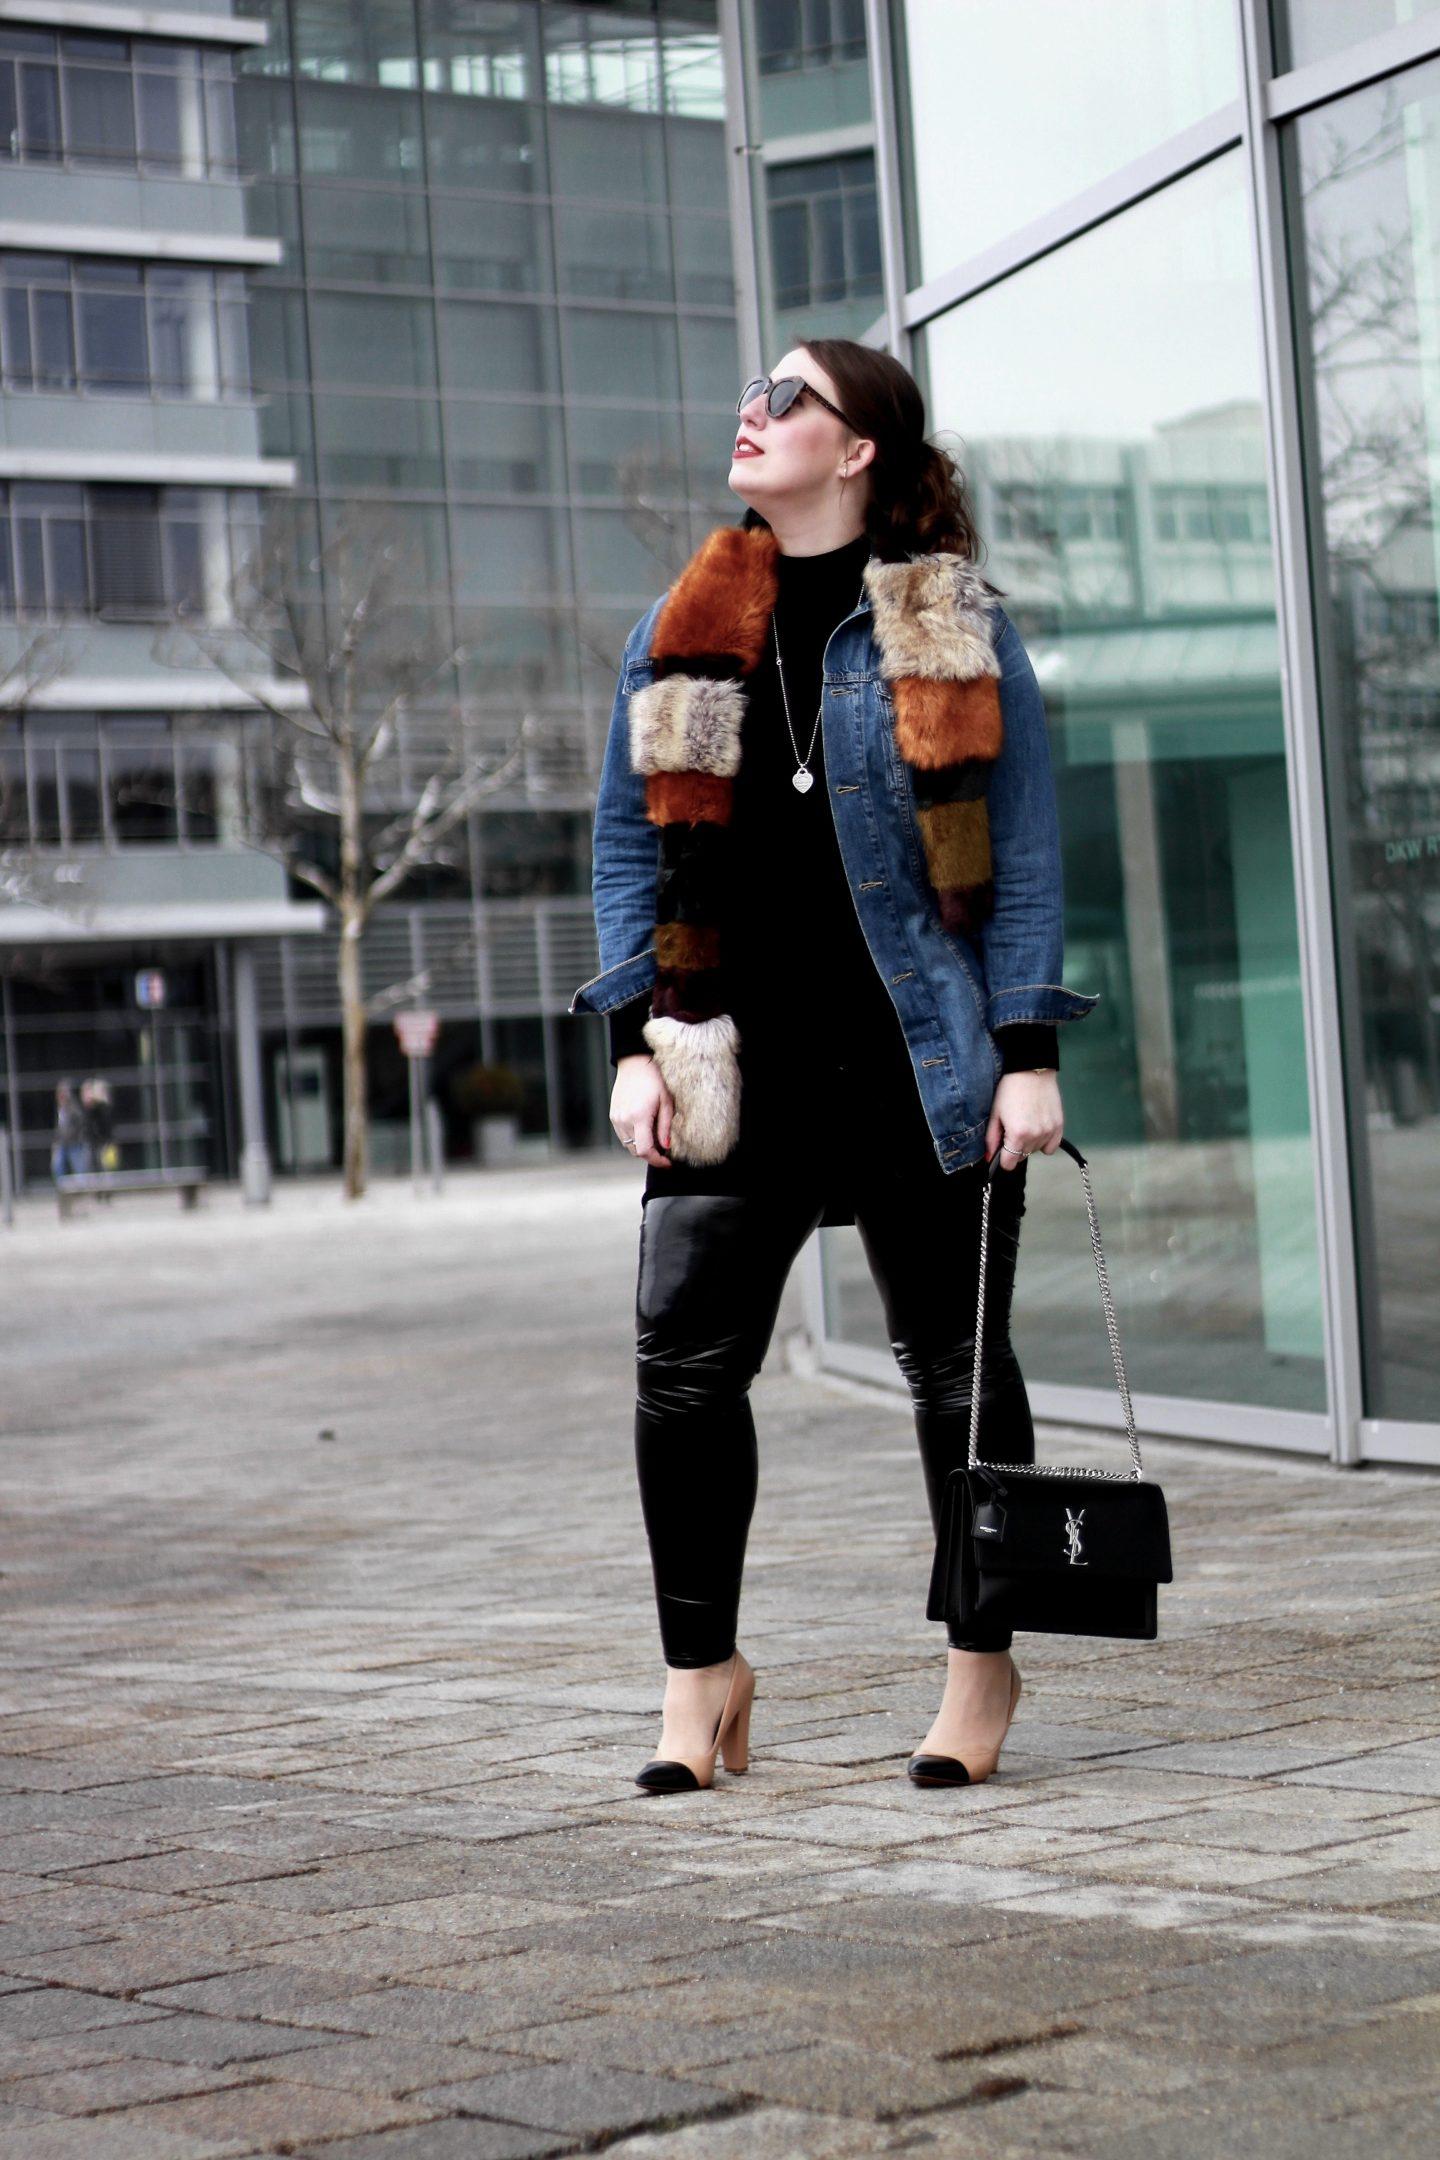 outfit-lässiger-streetstyle-oversize-jeansjacke-vinyl-hose-vinyl-lacklederhose-fake-fur-schal-ysl-saint-laurent-sunset-bag-zara-pumps-karen-walker-sunglasses-susanne-heidebach-misssuzieloves-miss-suzie-loves-fashionblogger-modeblogger-curvyblogger-münchen-museum-mobile-ingolstadt